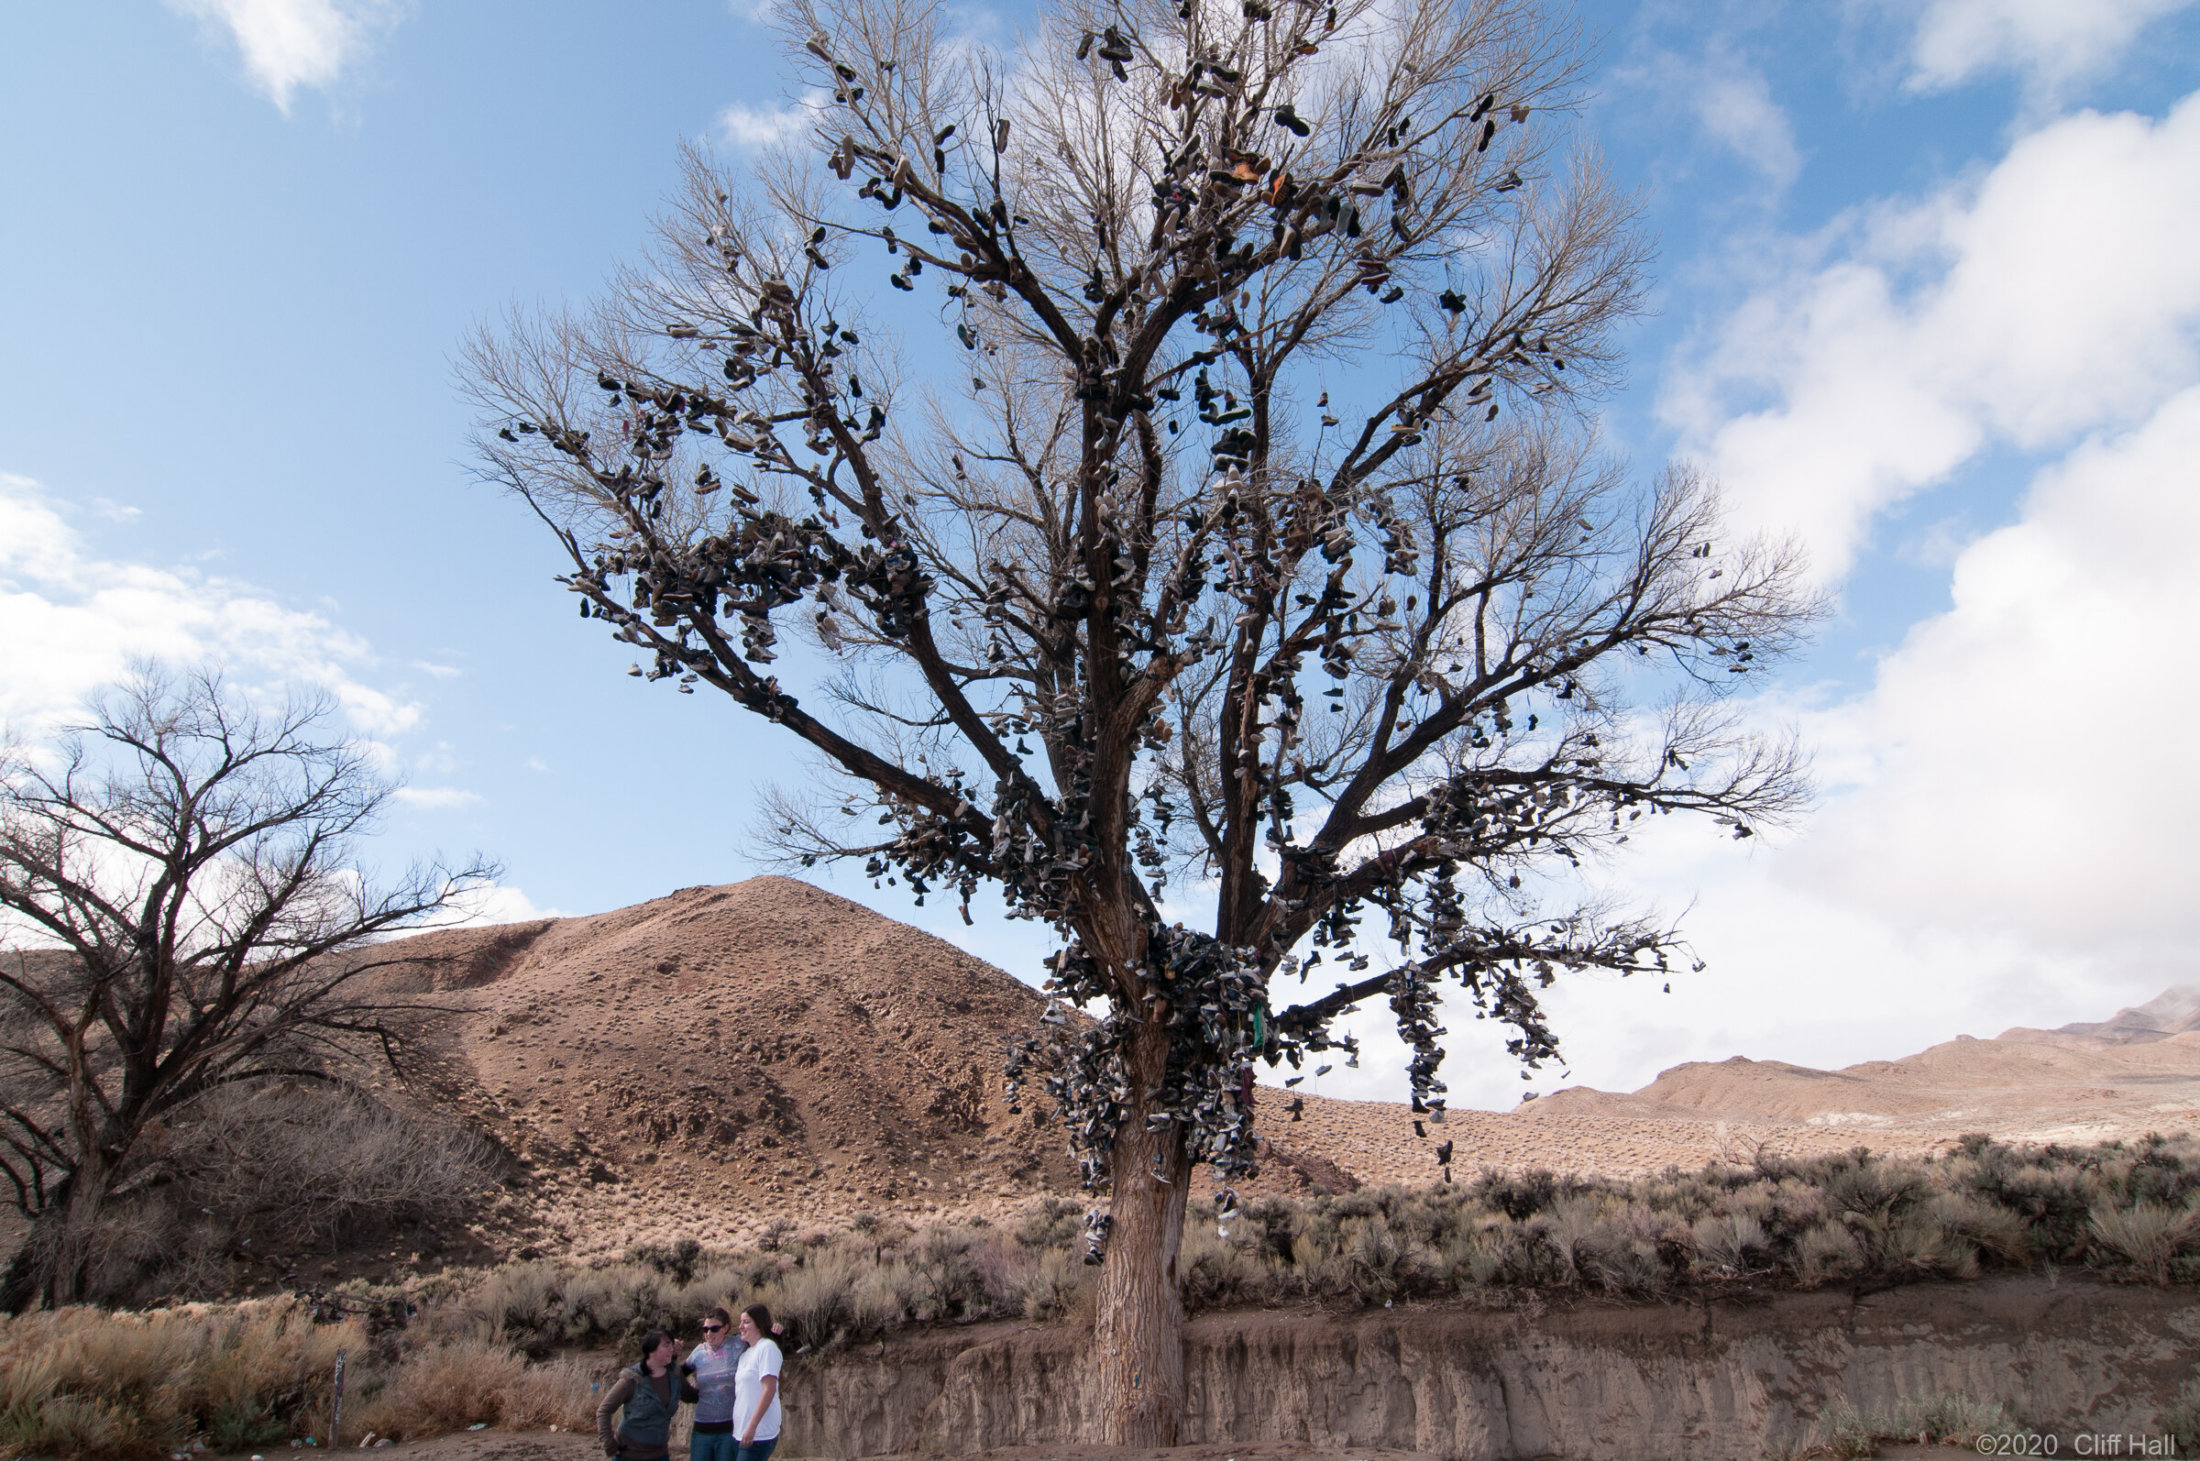 US-50 Shoe Tree, NV